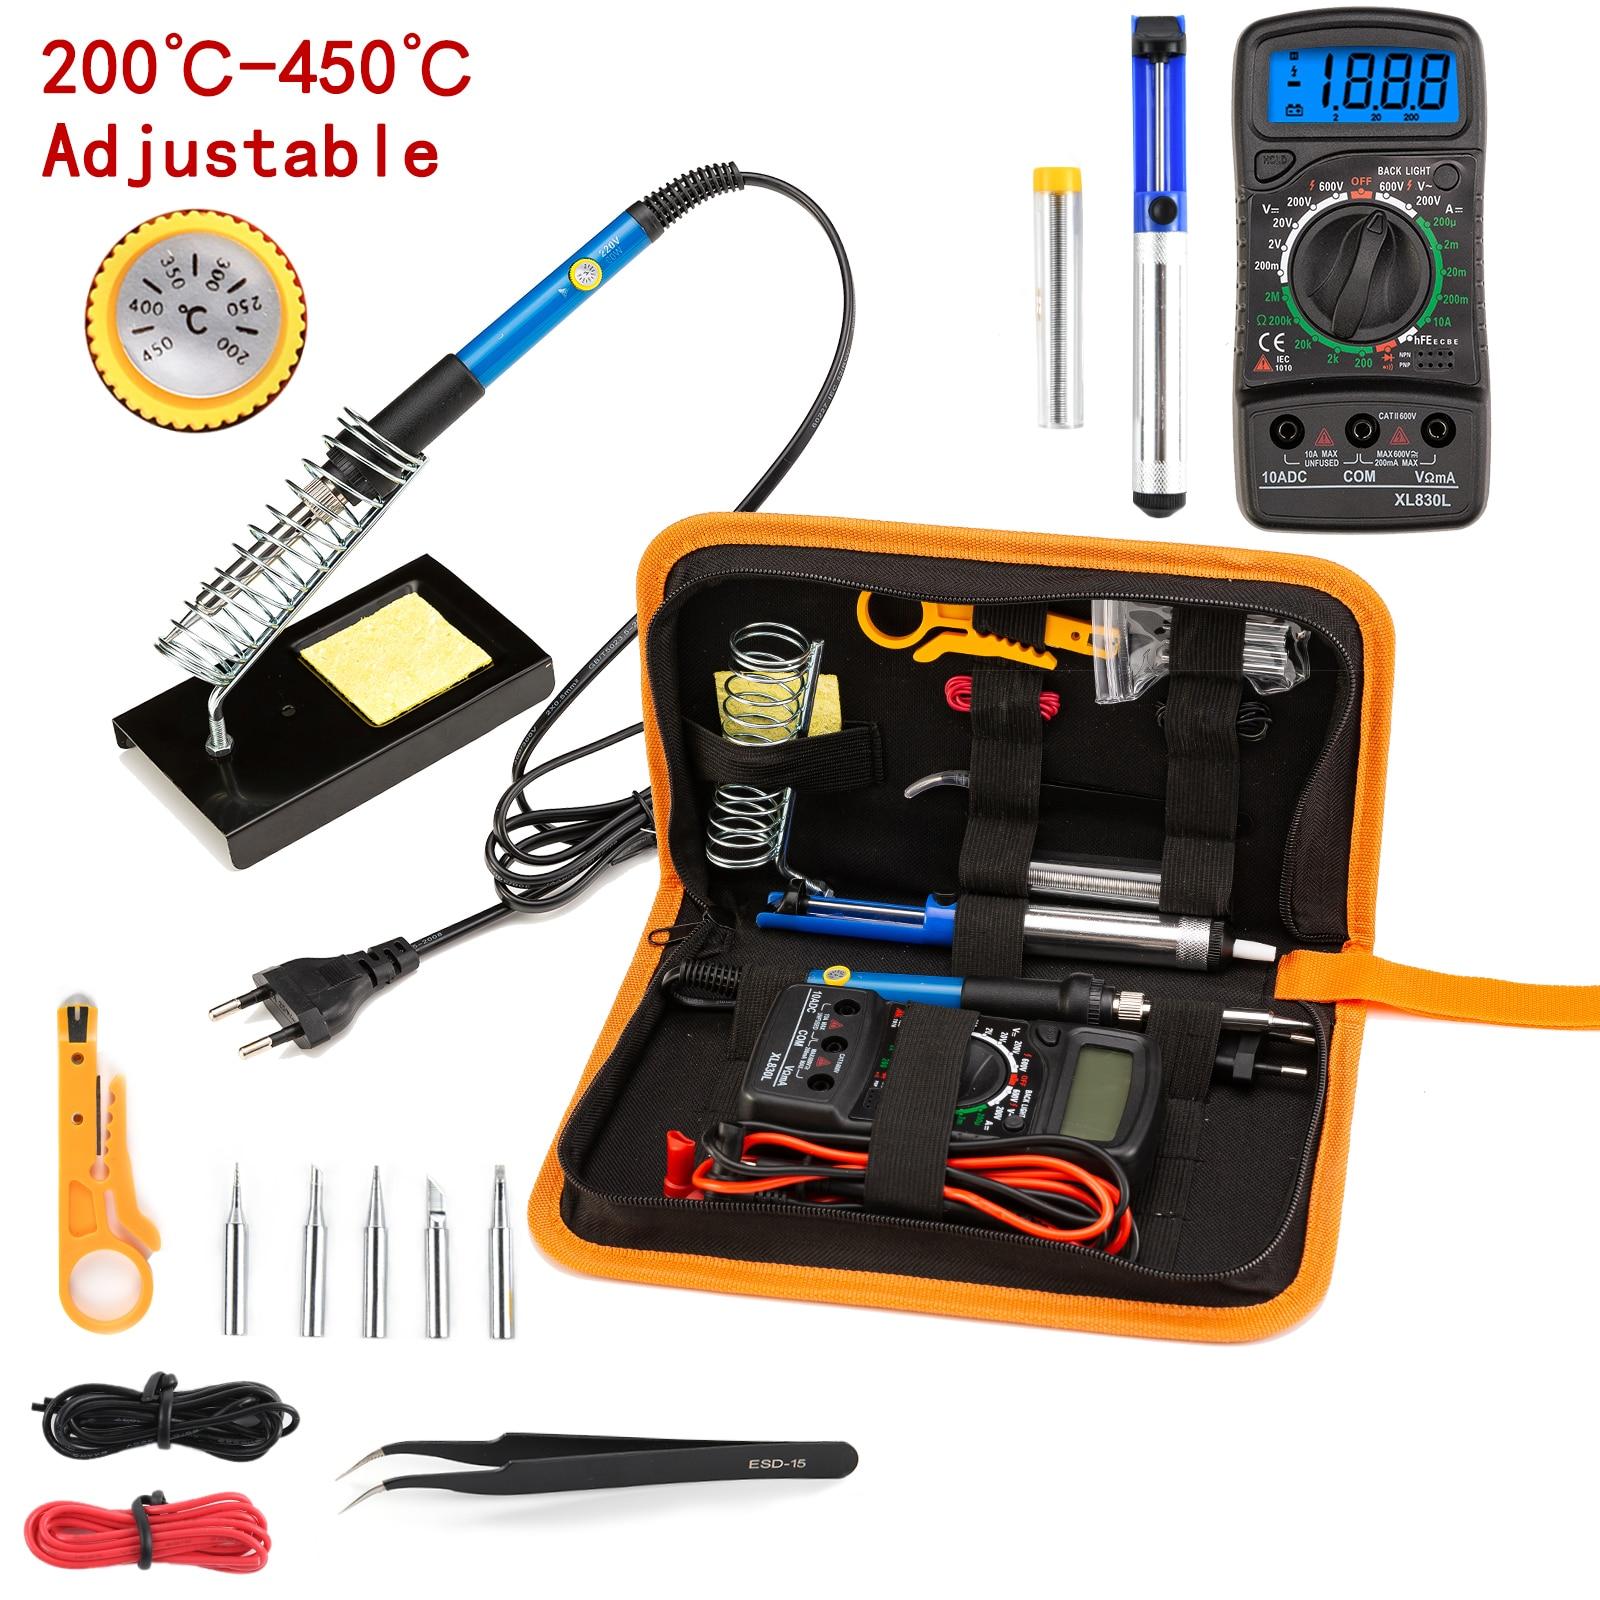 2021-soldering-iron-with-digital-multimeter-kit-adjustable-temperature-auto-ranging-ac-dc-tester-multimetro-welding-tool-kits